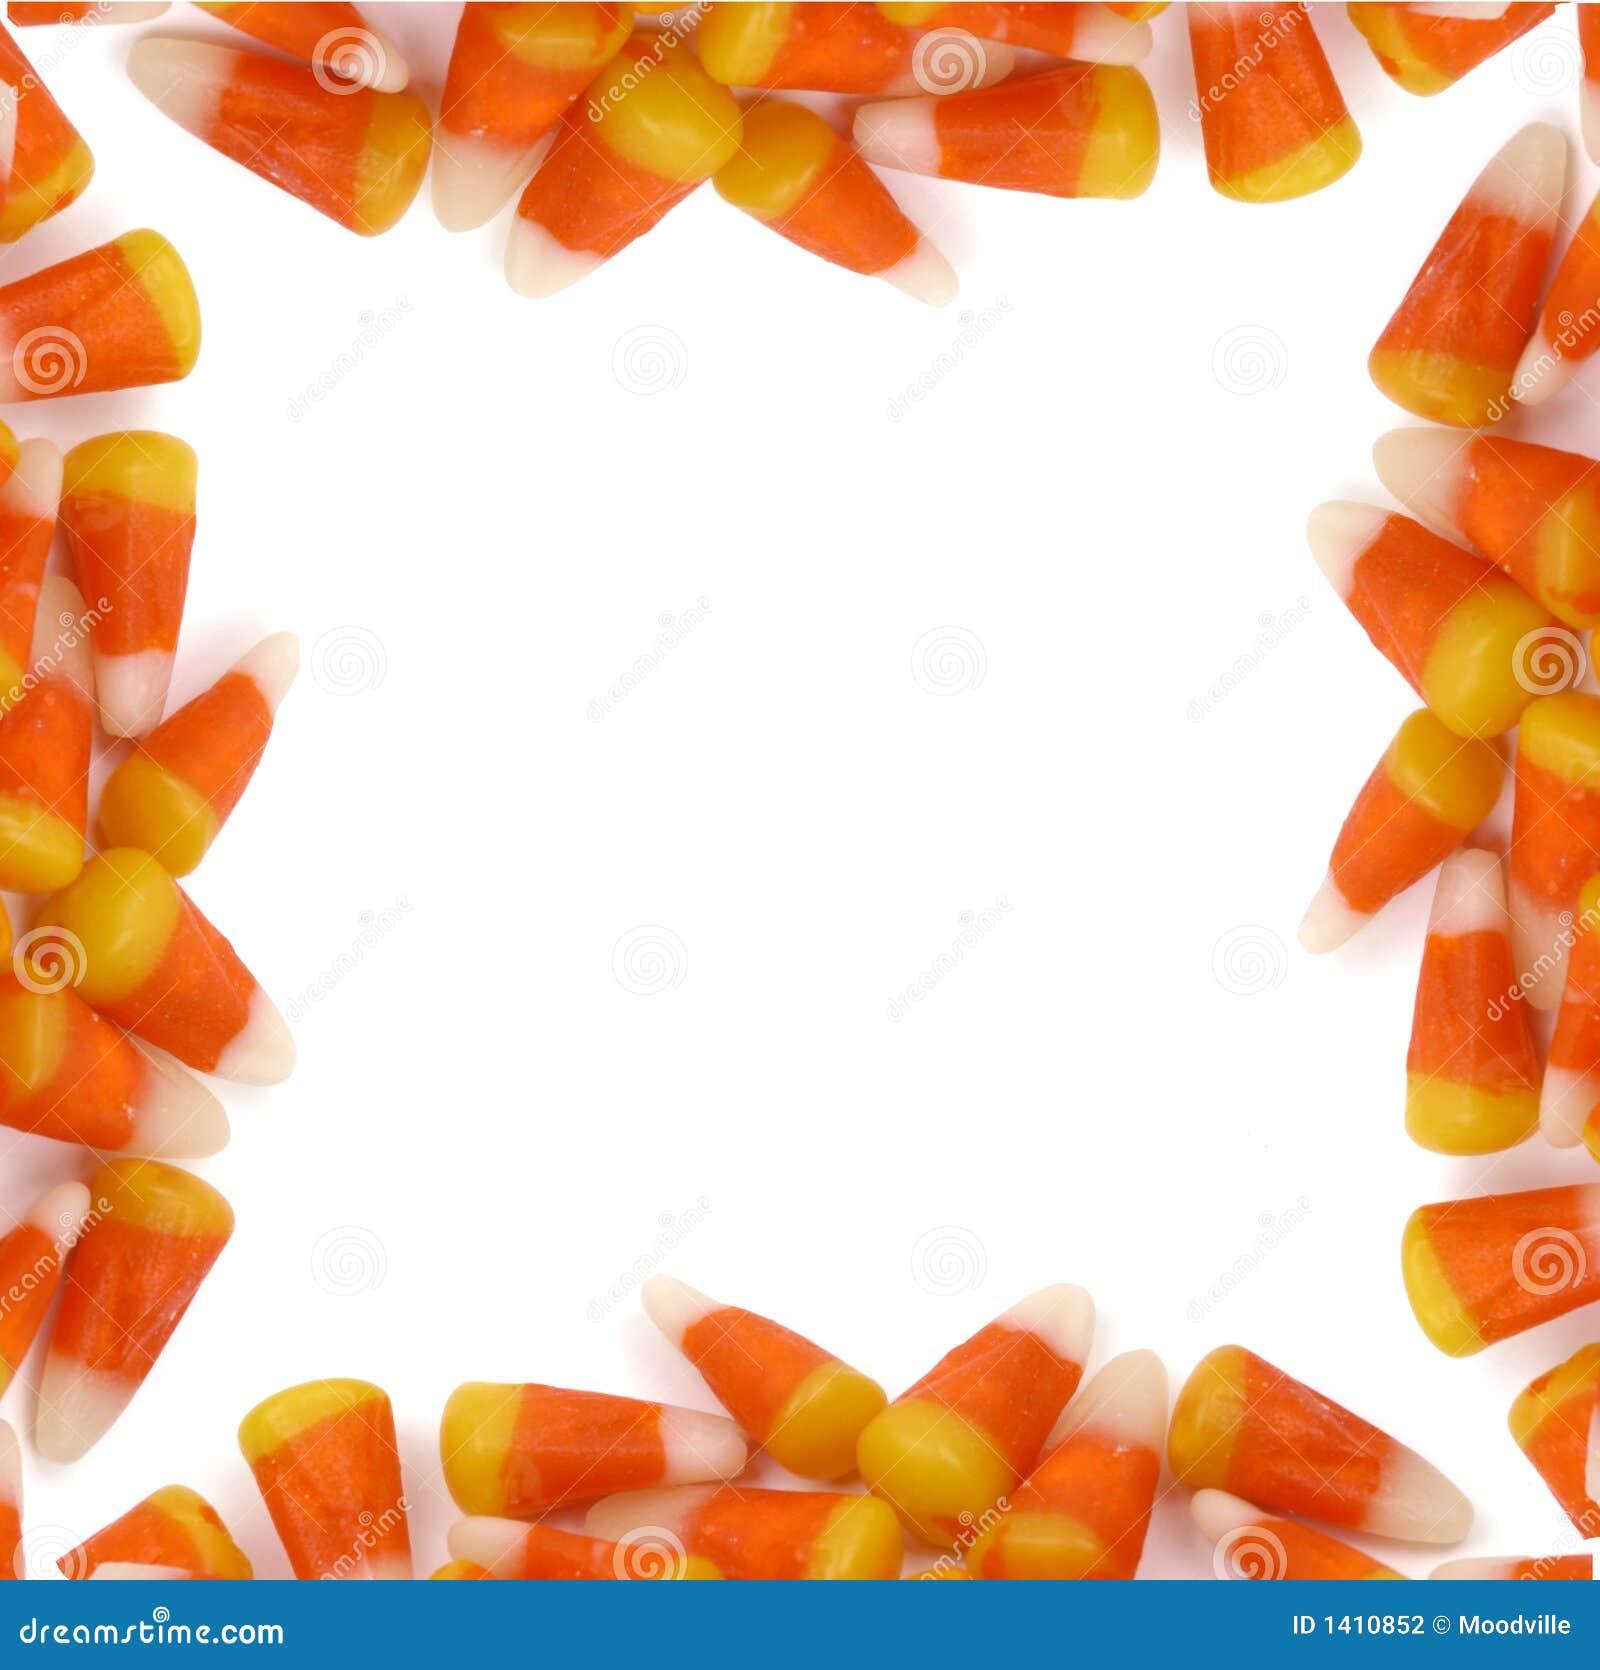 Halloween - Candy Corn Border Stock Photo - Image of autumn, food ...